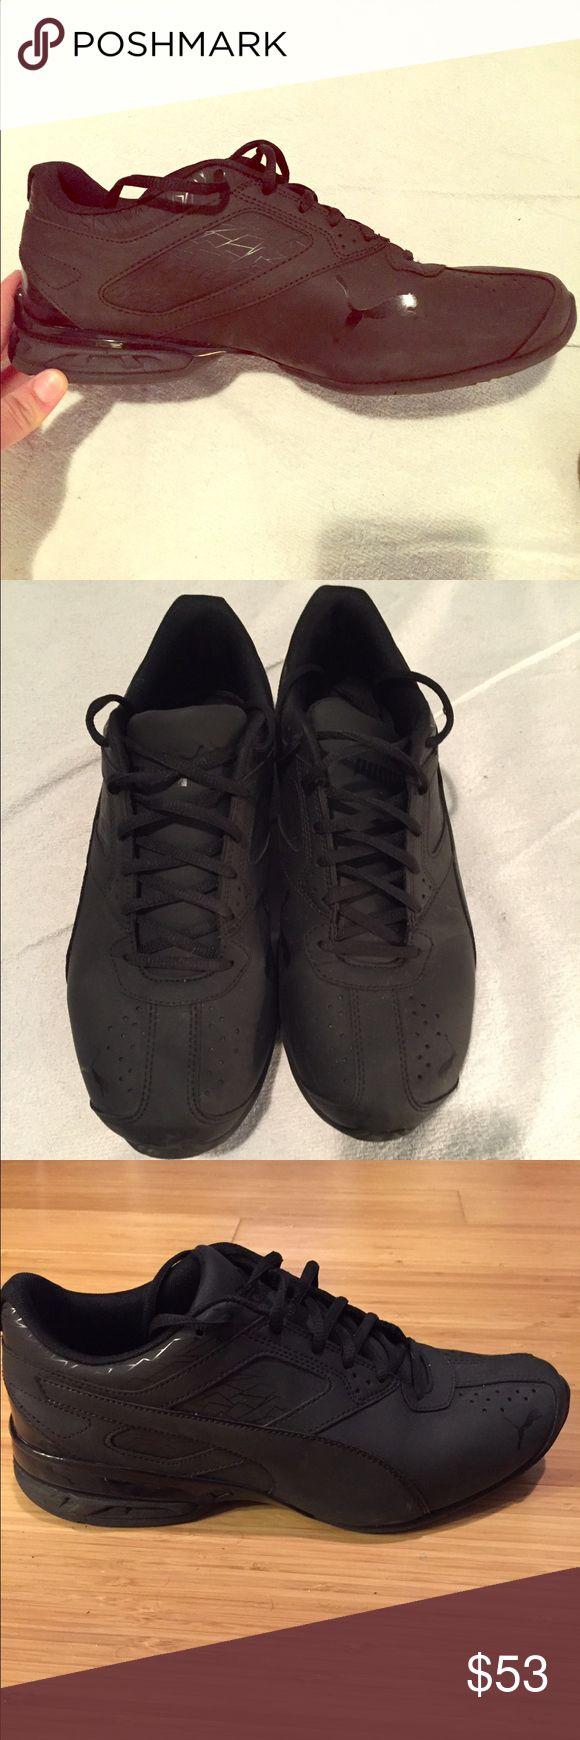 Selling this Men's Puma tennis shoes on Poshmark! My username is: mpalisano. #shopmycloset #poshmark #fashion #shopping #style #forsale #Puma #Shoes